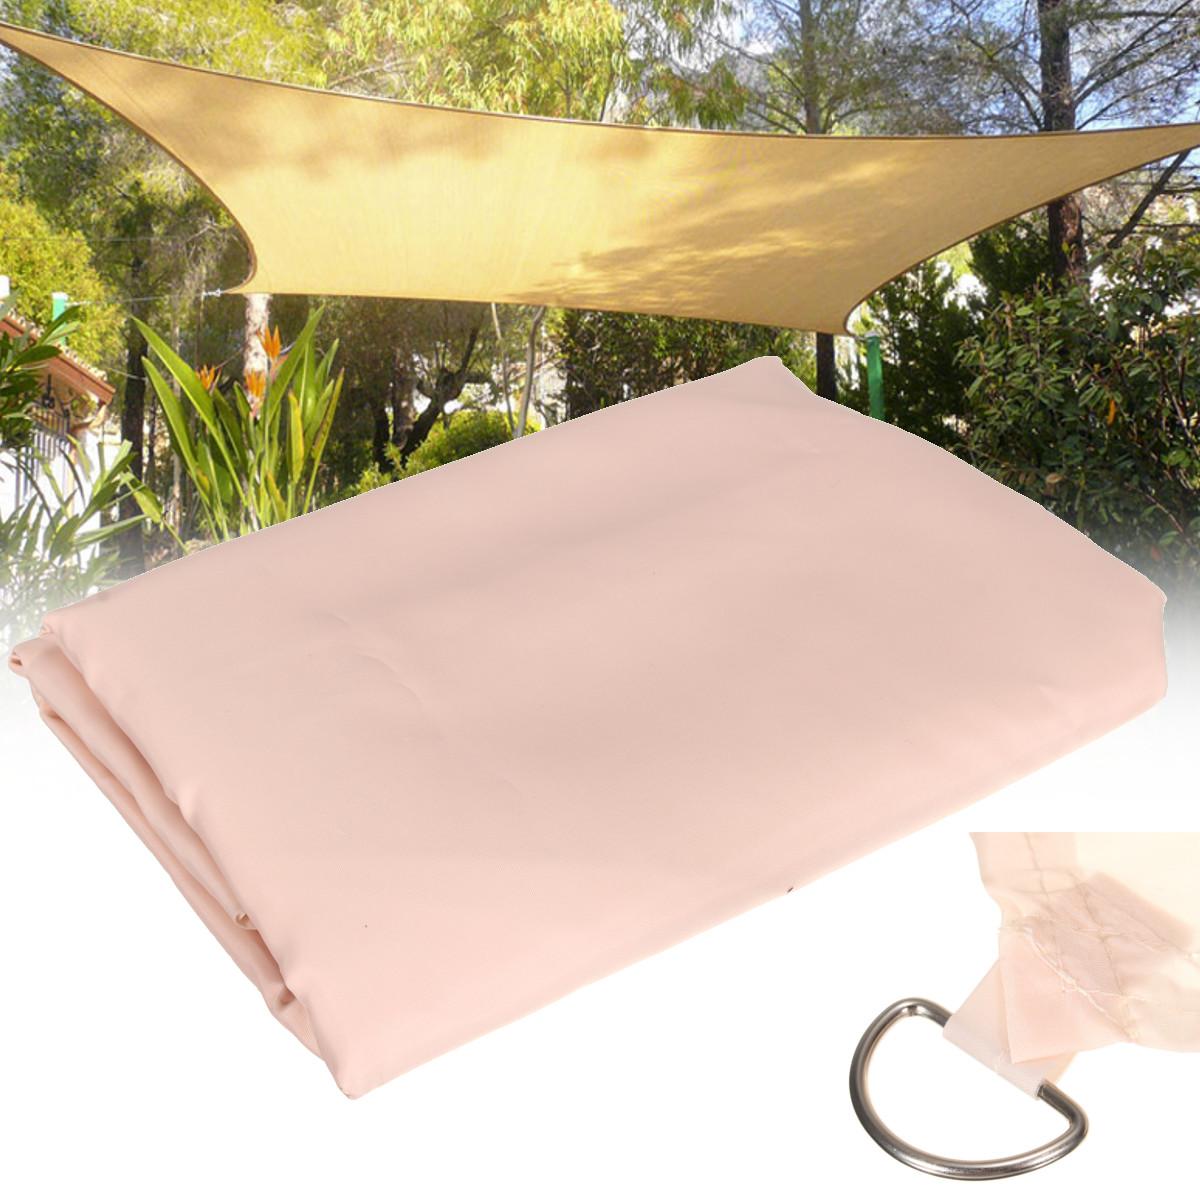 2MX2M Patio SunShade Sail Shelter Net Outdoor Garden Car Cover Awning Canopy Patio